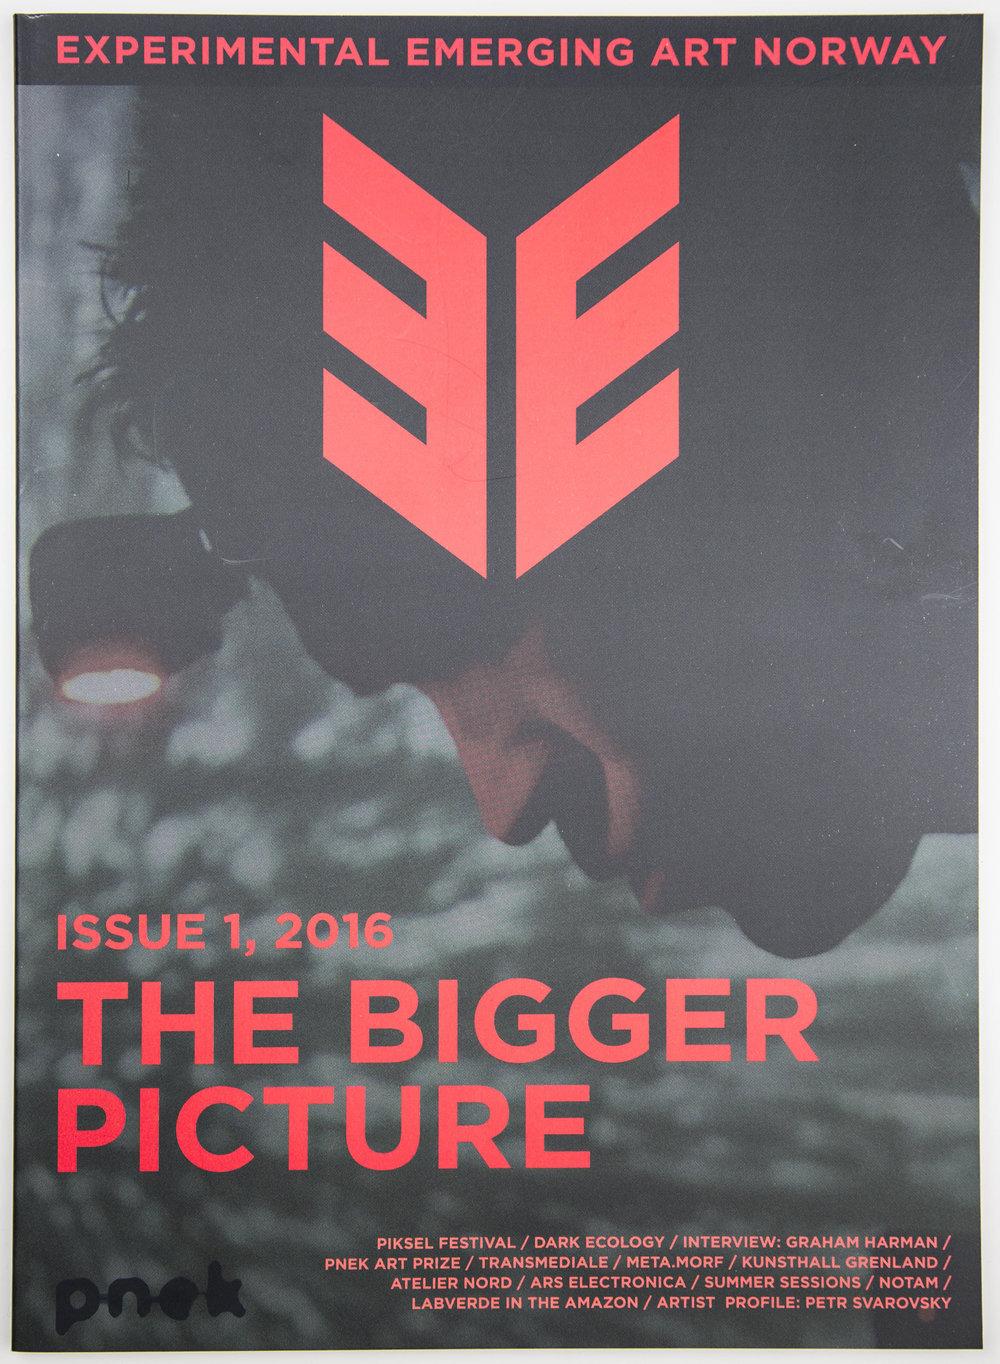 EE Experimental Emerging Art #1 : The Bigger Picture  Stahl Stenslie, Zane Cerpina (eds.). PNEK, 2017. ISSN: 2464-448X  eejournal.no